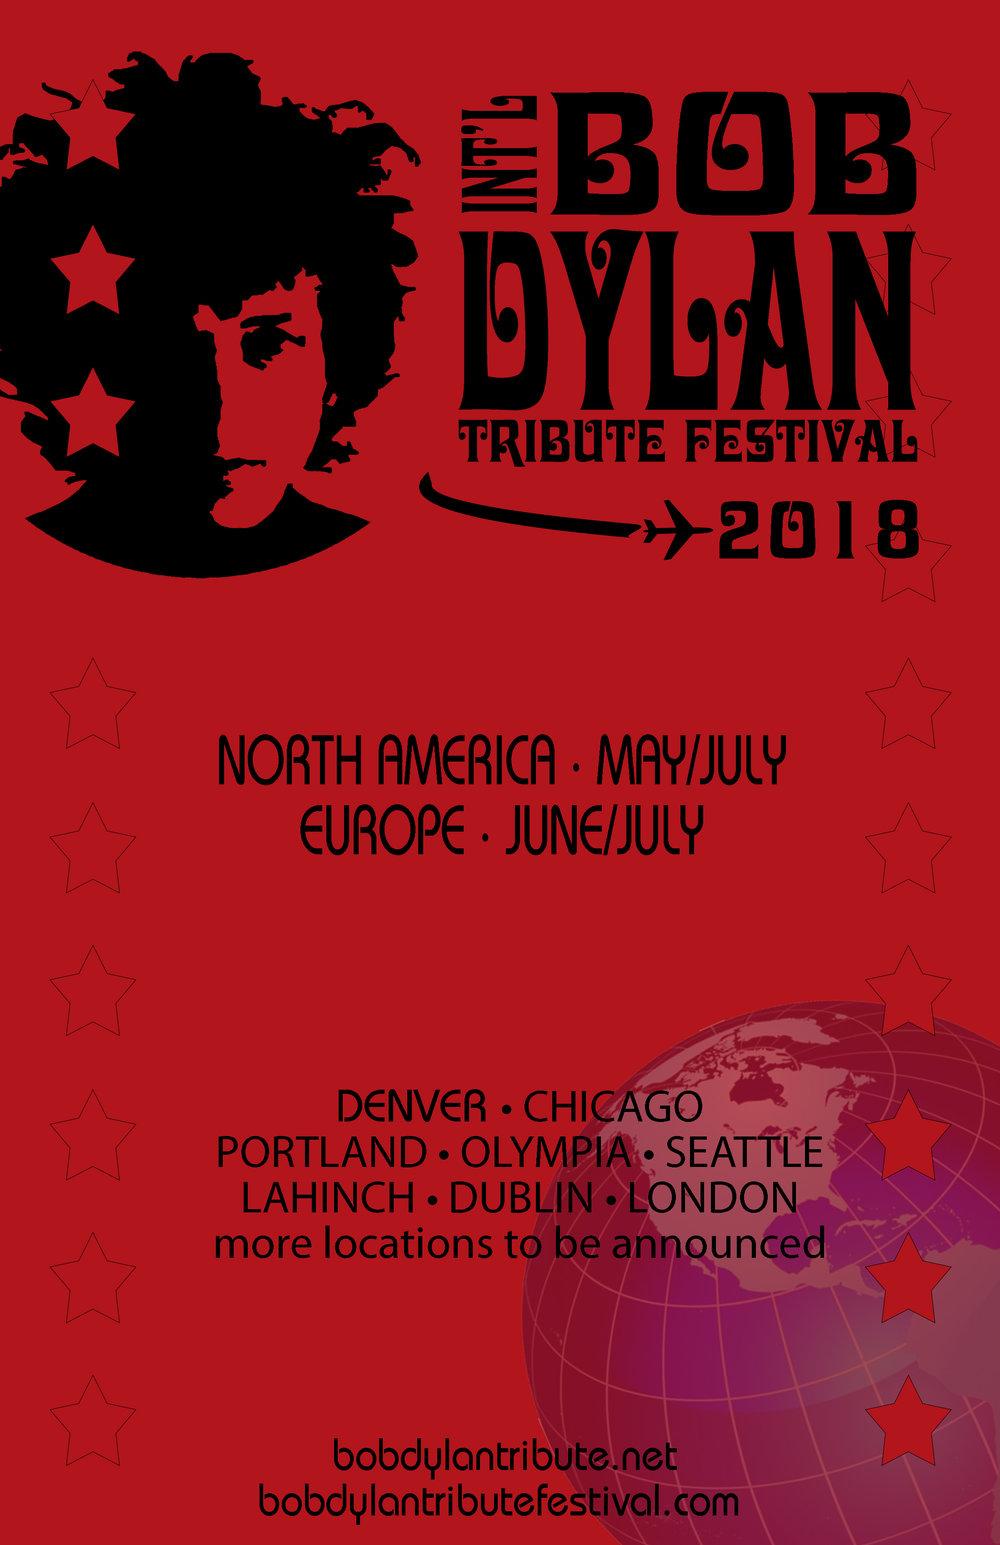 Dylan77-2018-GENERIC-1.jpg